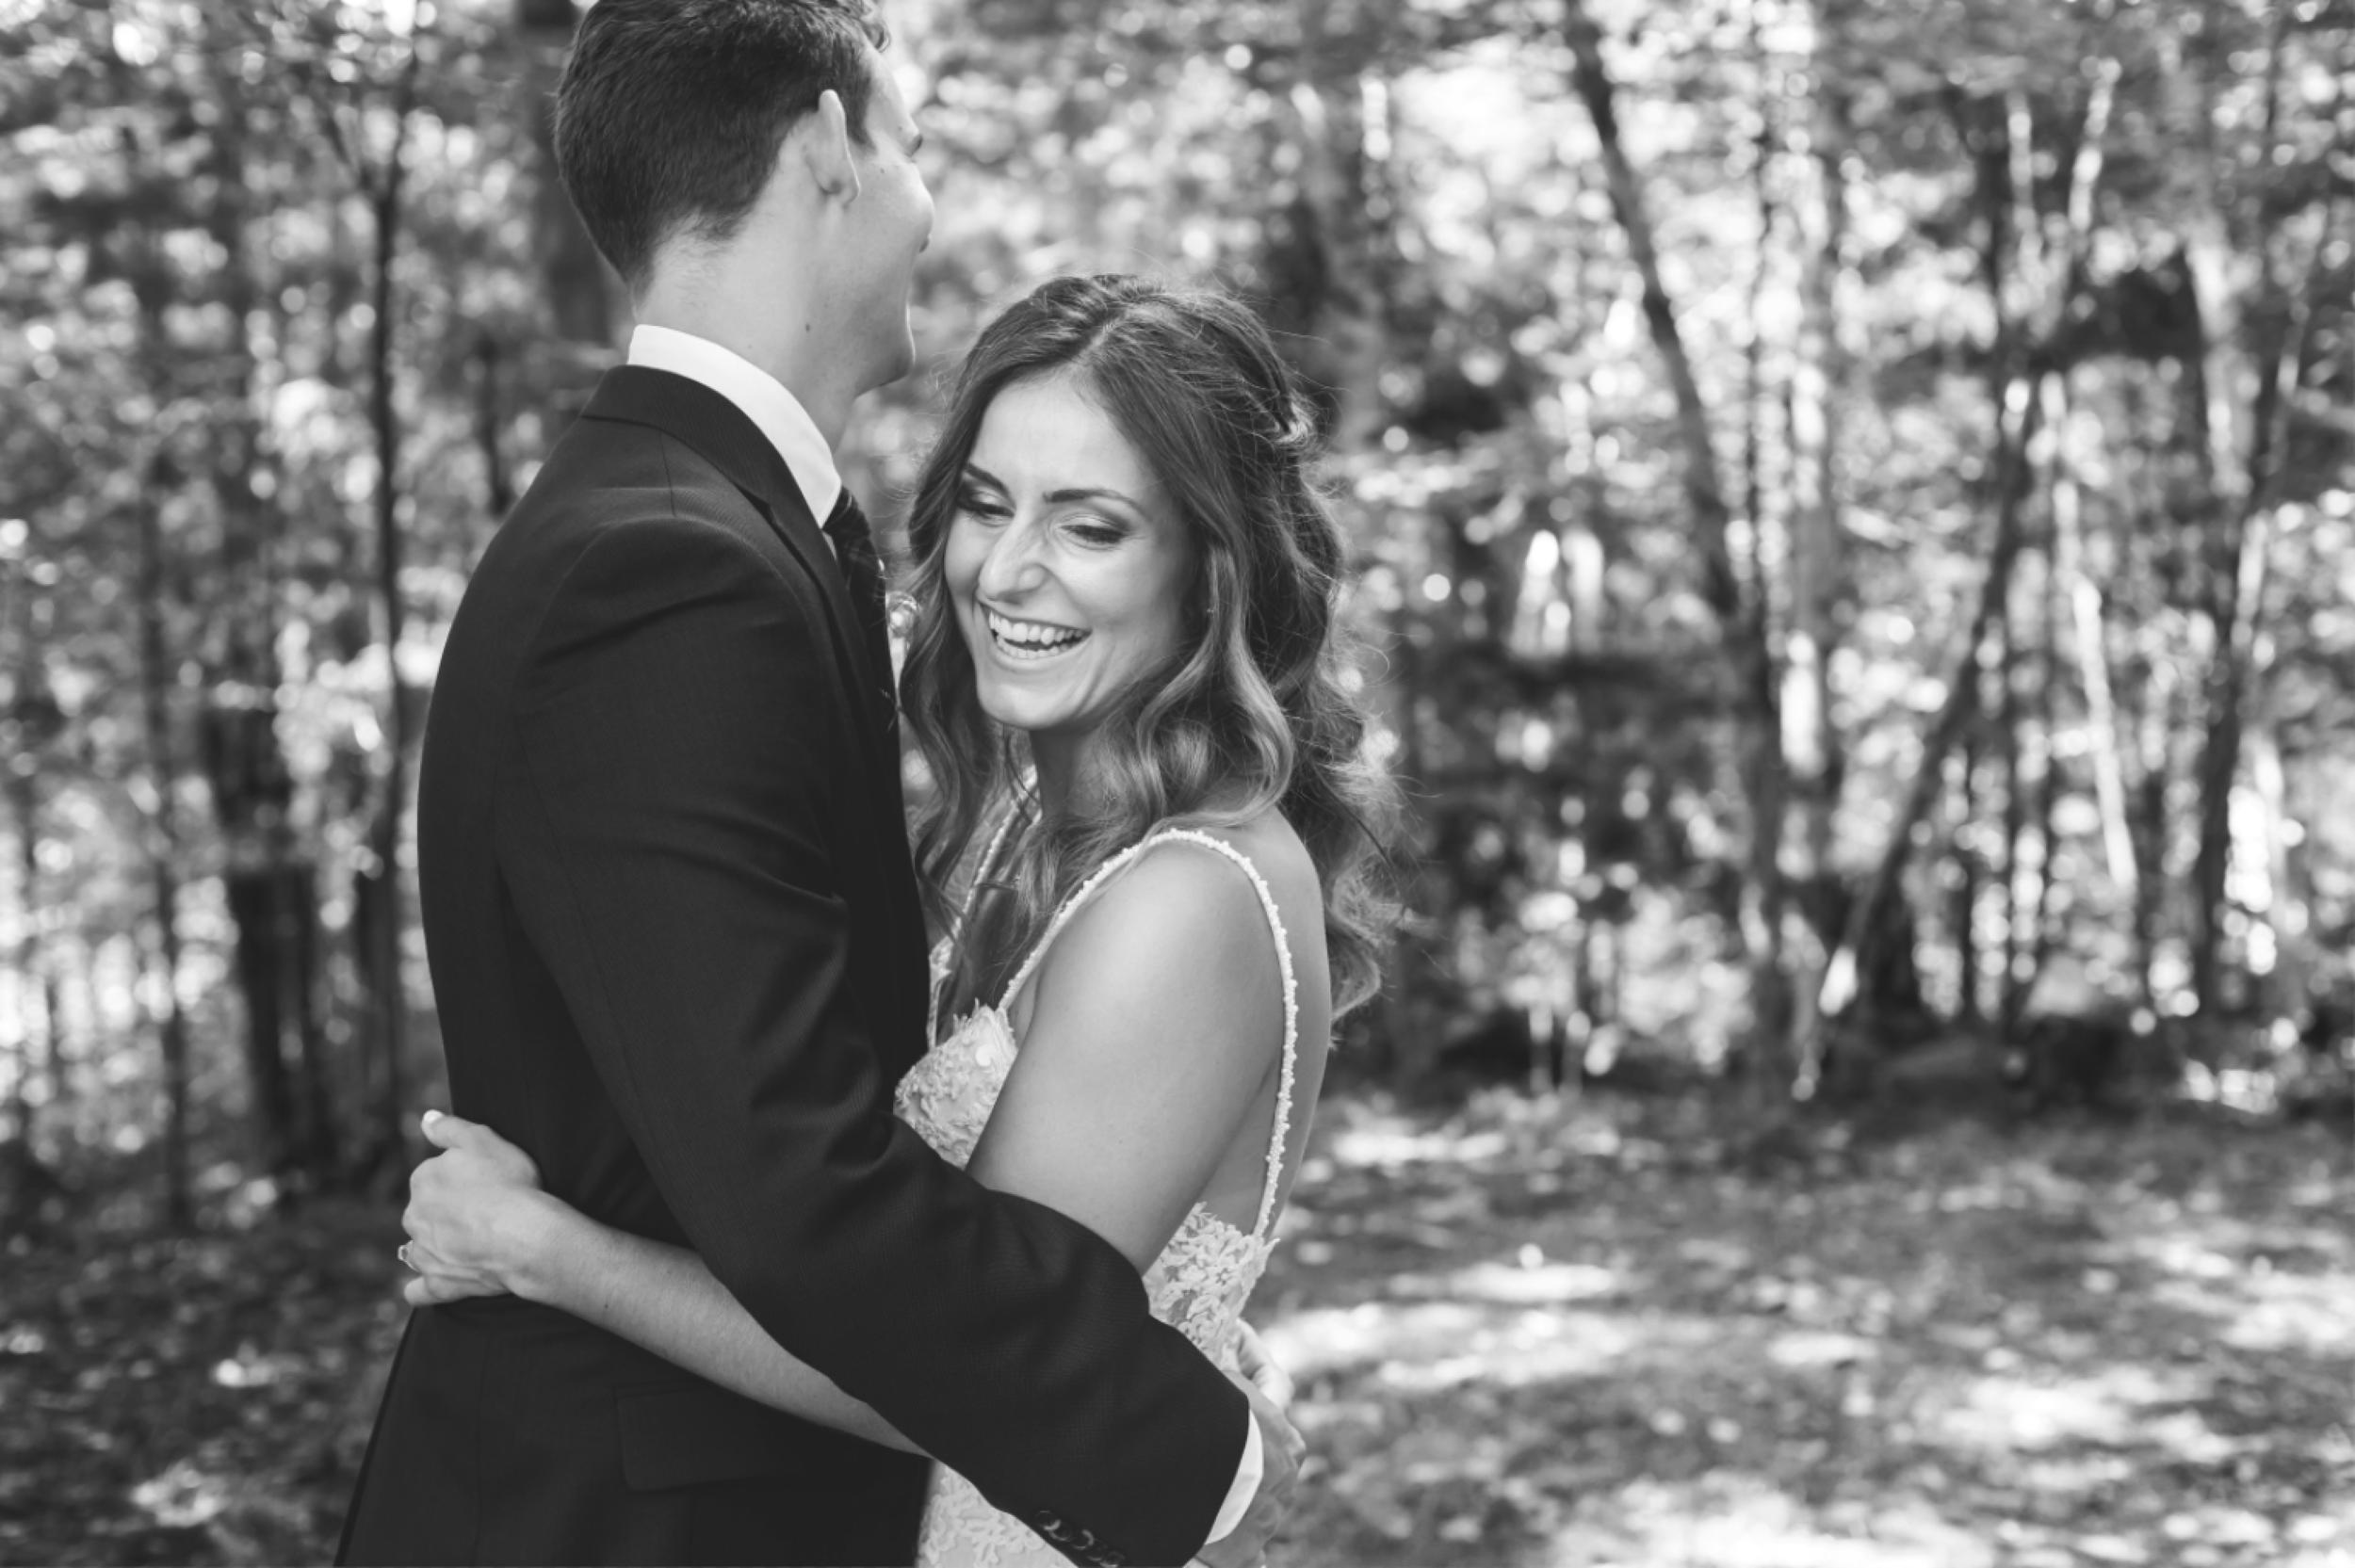 Wedding-Photos-Muskoka-Clevelands-House-Photographer-Wedding-Hamilton-GTA-Niagara-Oakville-Moments-by-Lauren-Photography-Photo-Image-38.png